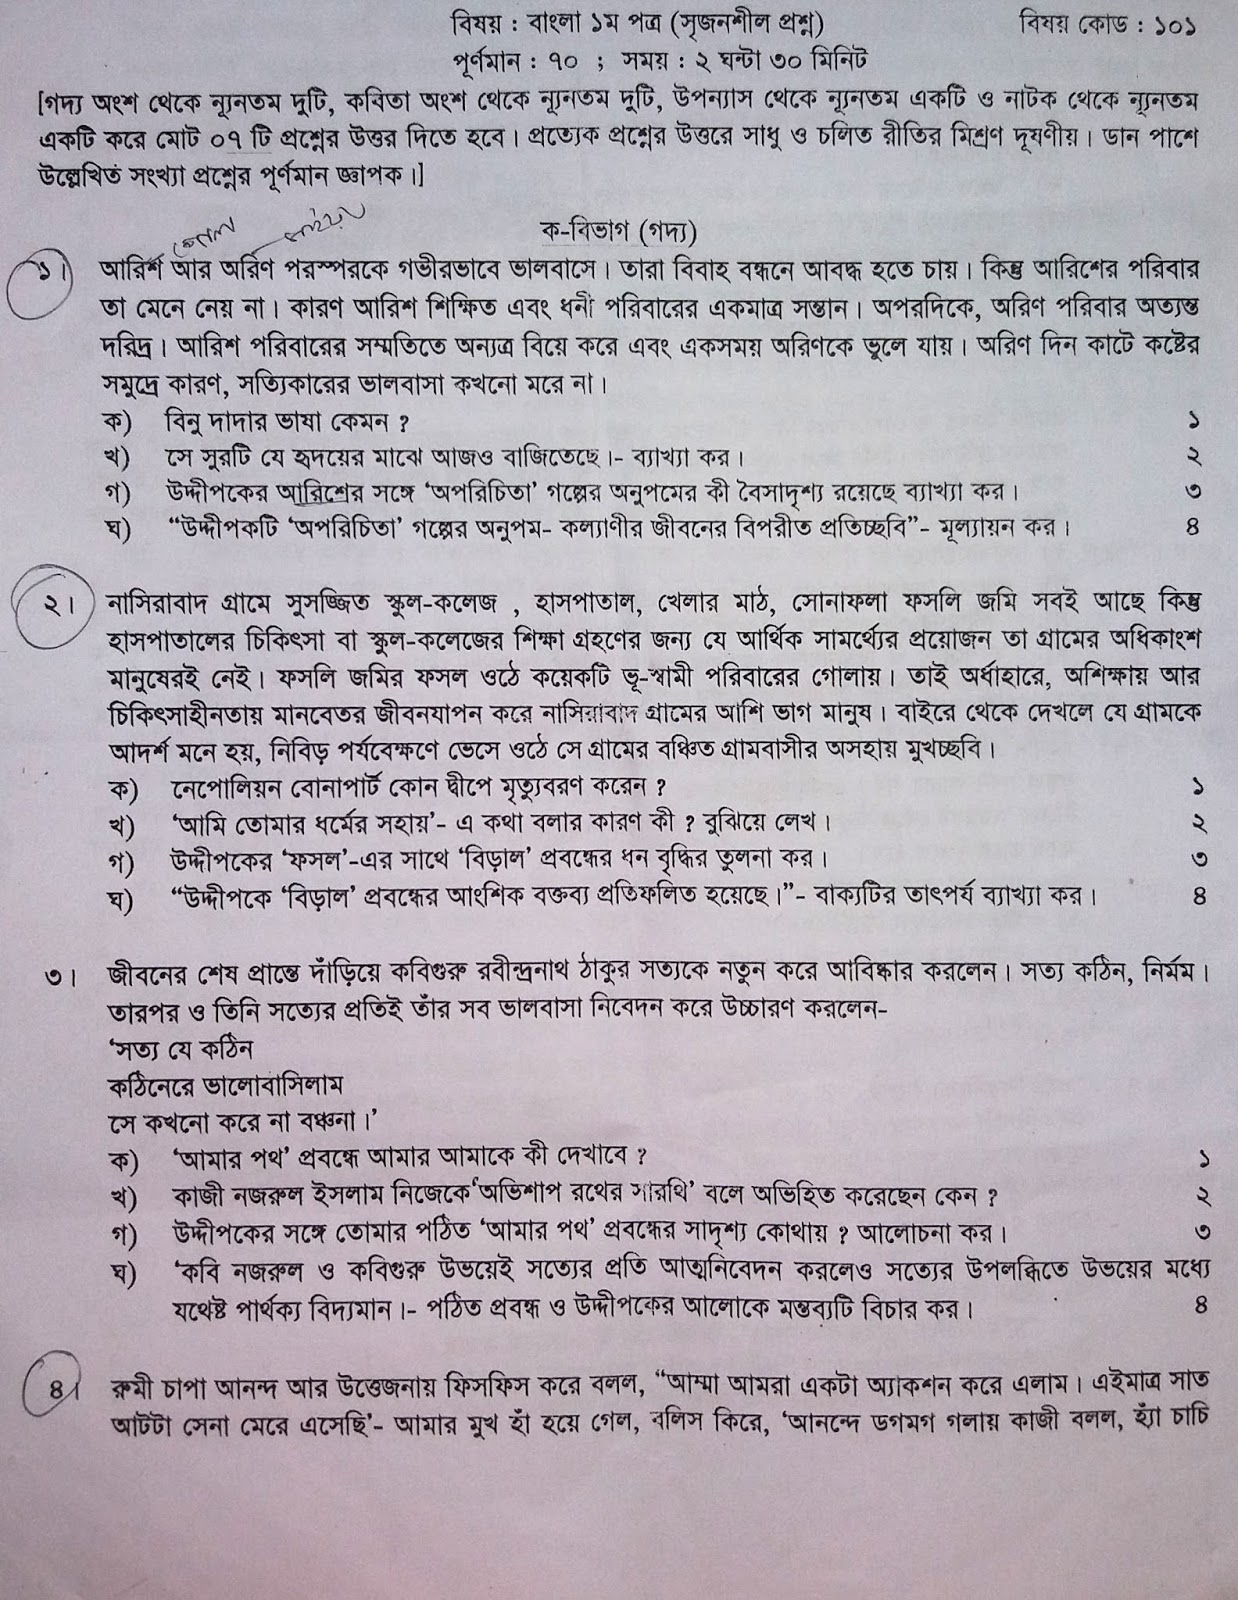 bangla essay Bangabandhu sheikh mujibur rahman is the founder of the people's republic of bangladesh he is the father of the bangladeshi nation we call him jatir jonok (pita.